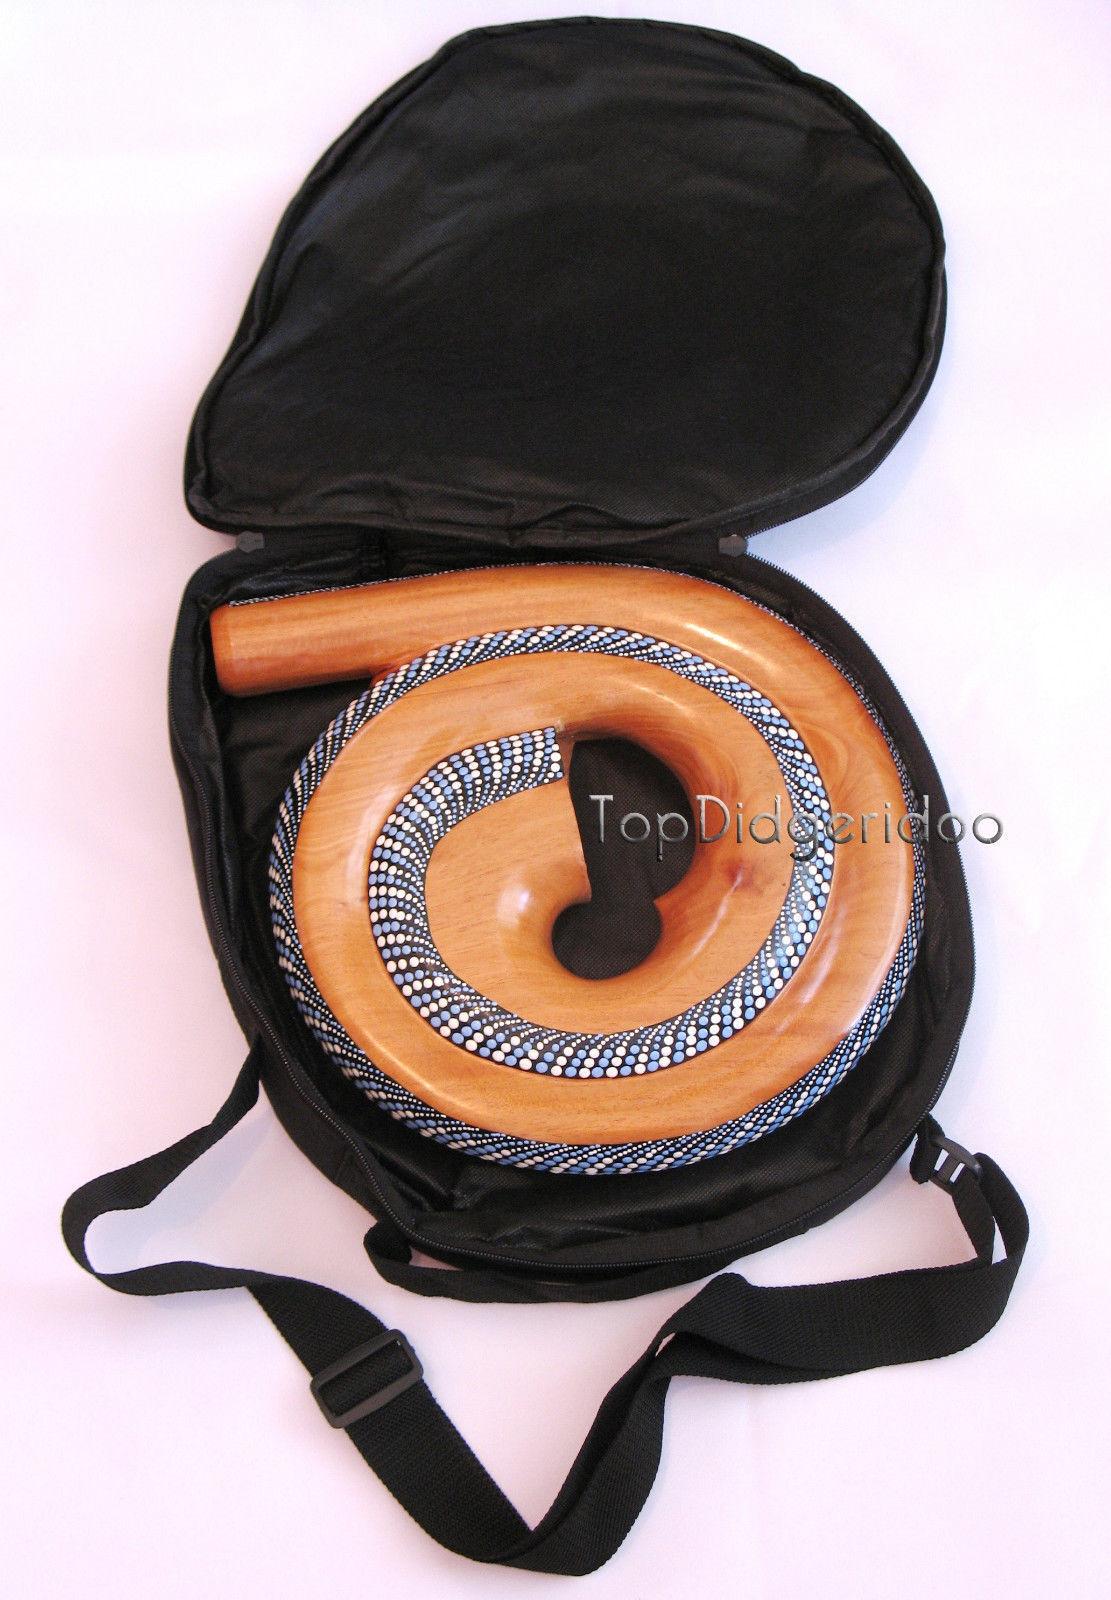 Spirale Didgeridoo + Sac Voyage Compact Escargot Coque Acajou Bois Main Gravé